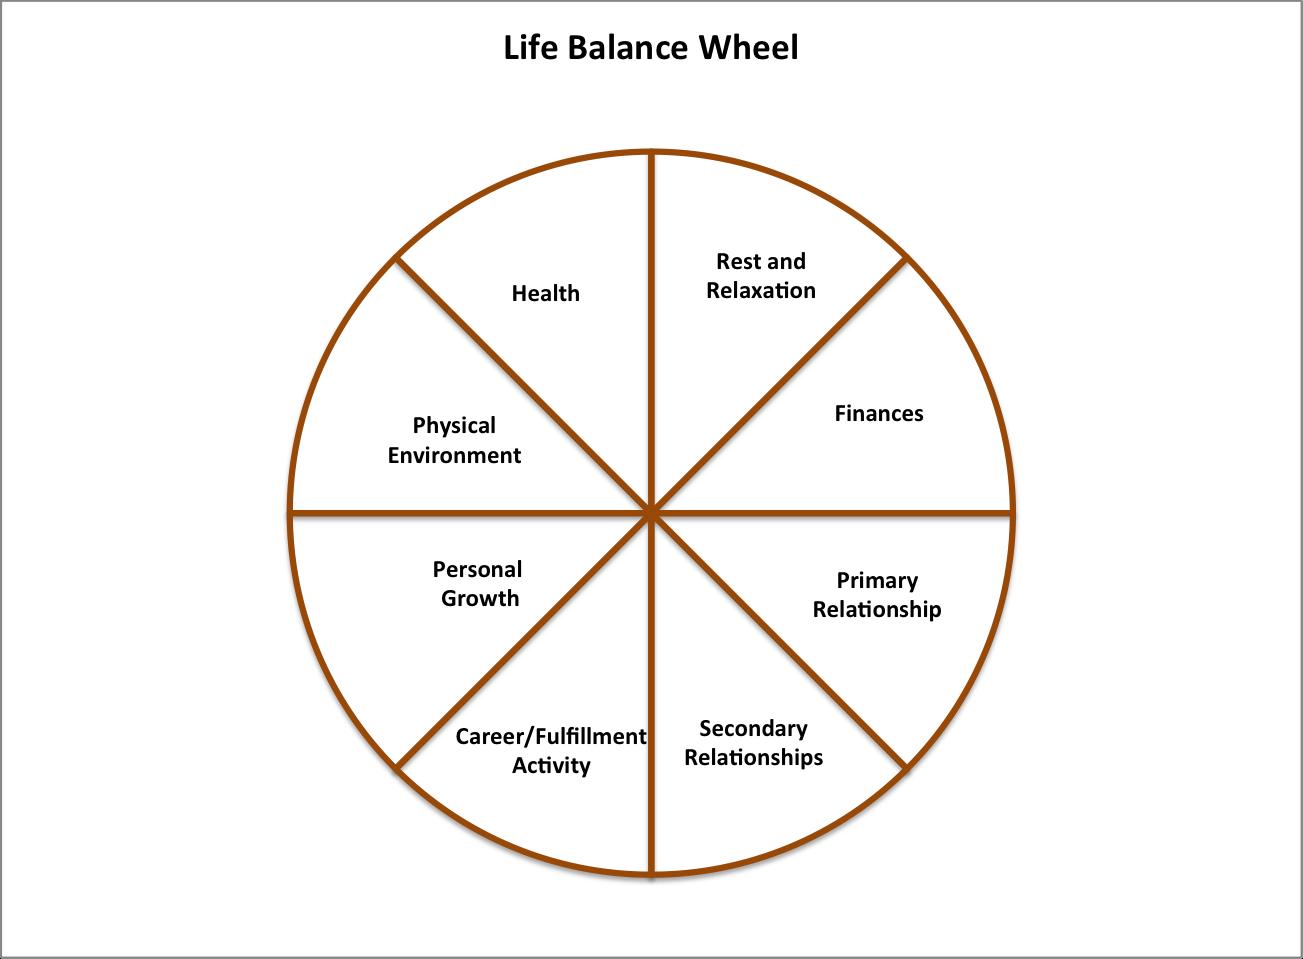 Life Balance Wheel | Christian Life Coaching, Life Balance For Wheel Of Life Template Blank